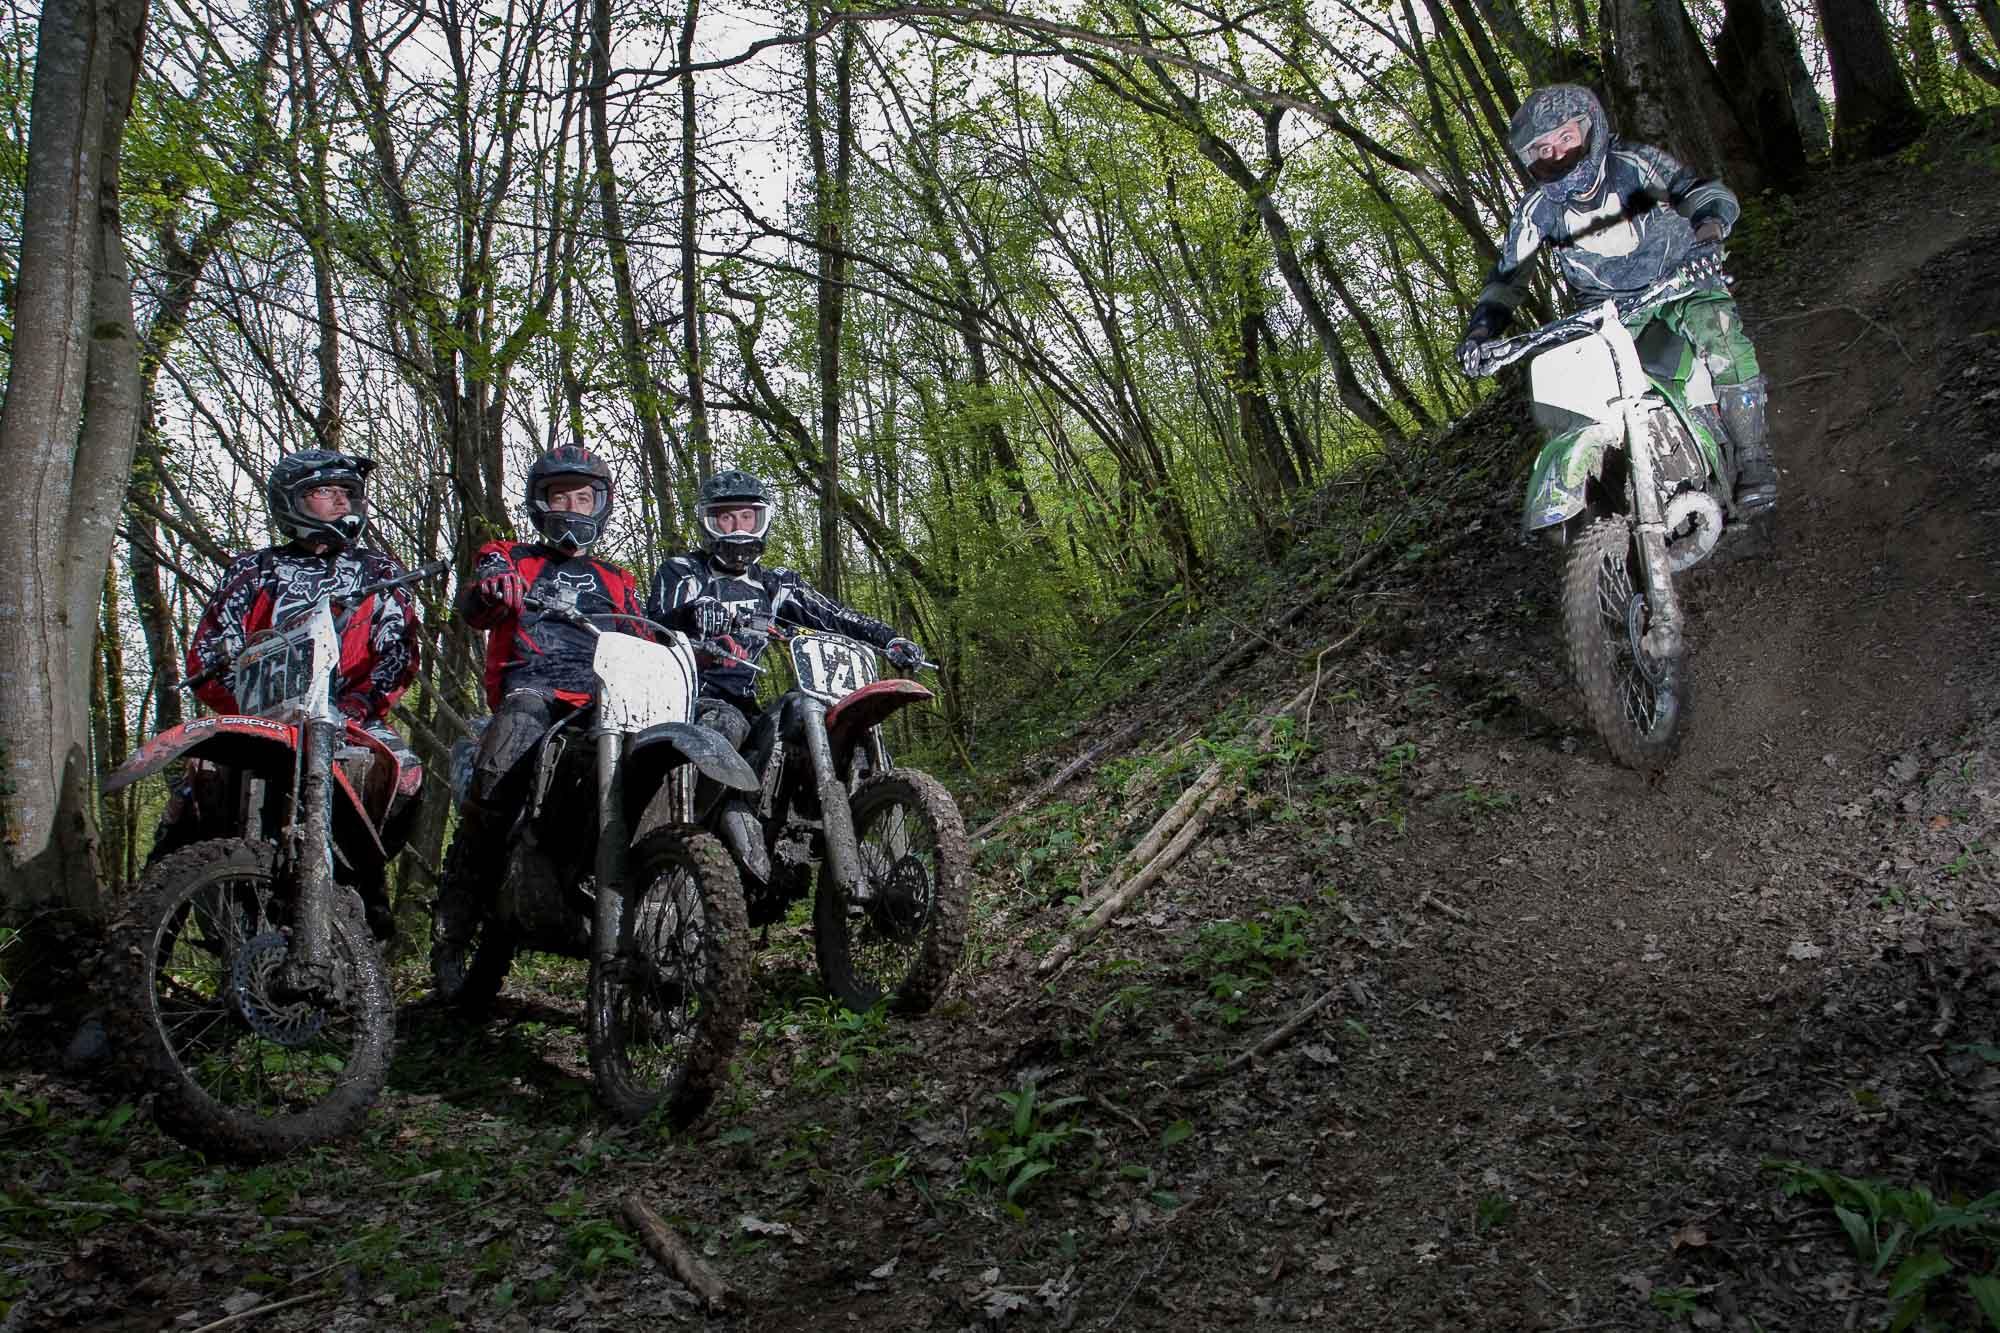 20100425-motos yvoire-35.jpg